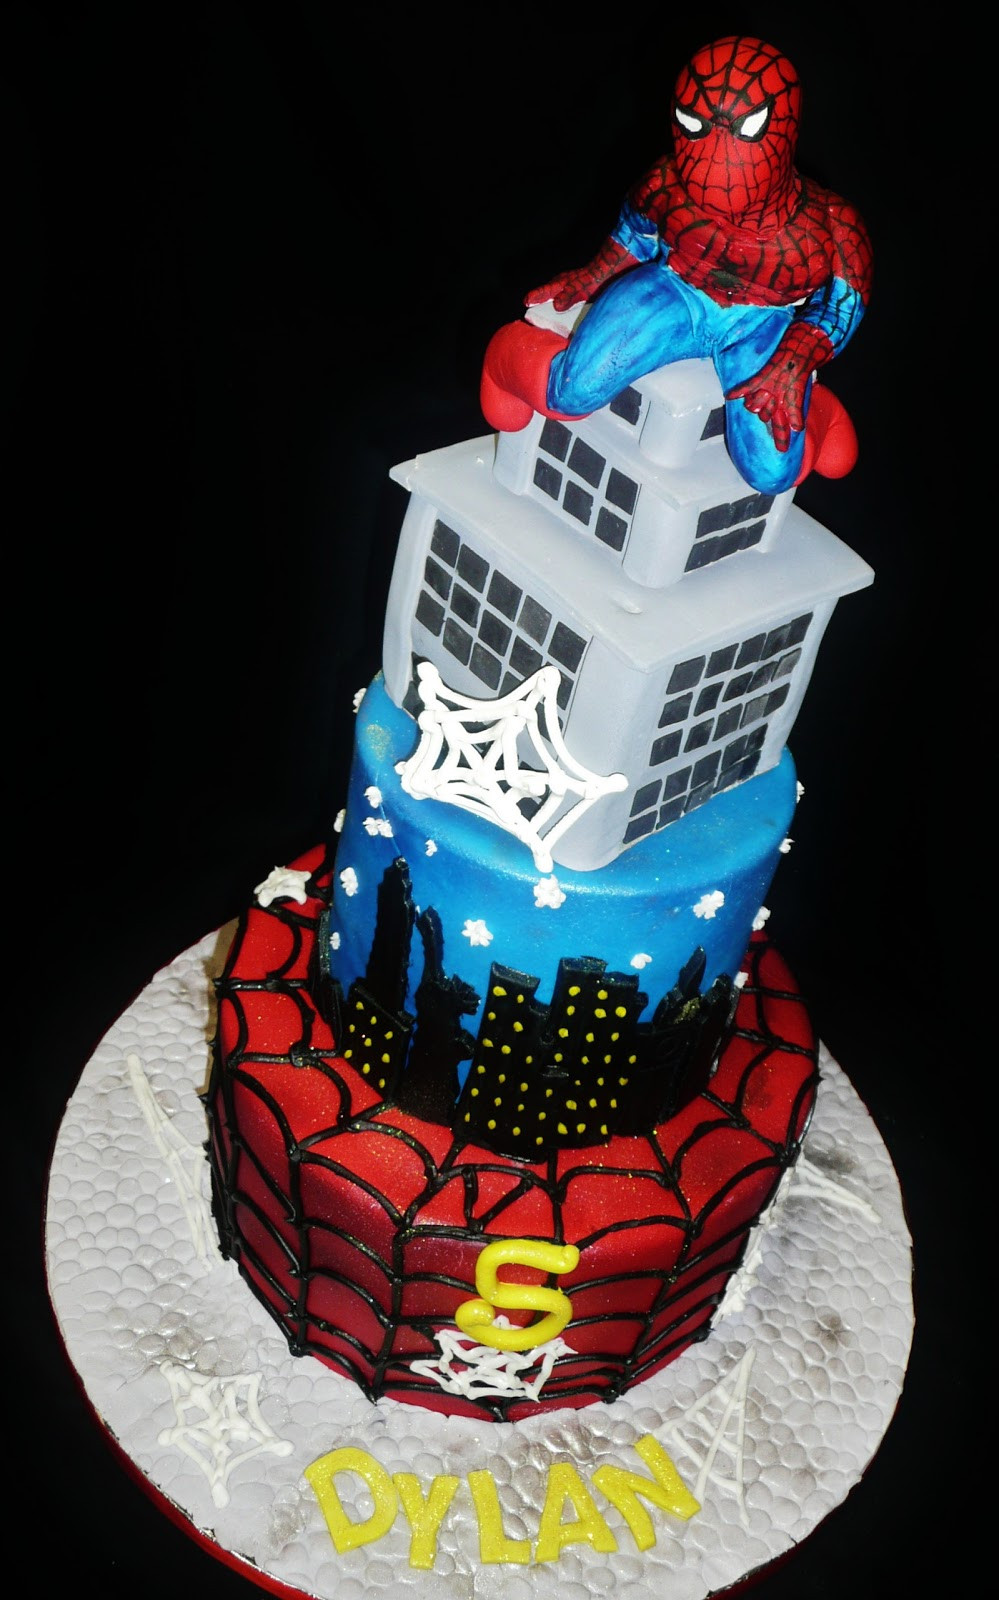 Spiderman Birthday Cakes  Baking with Roxana s Cakes Spiderman Birthday Cake